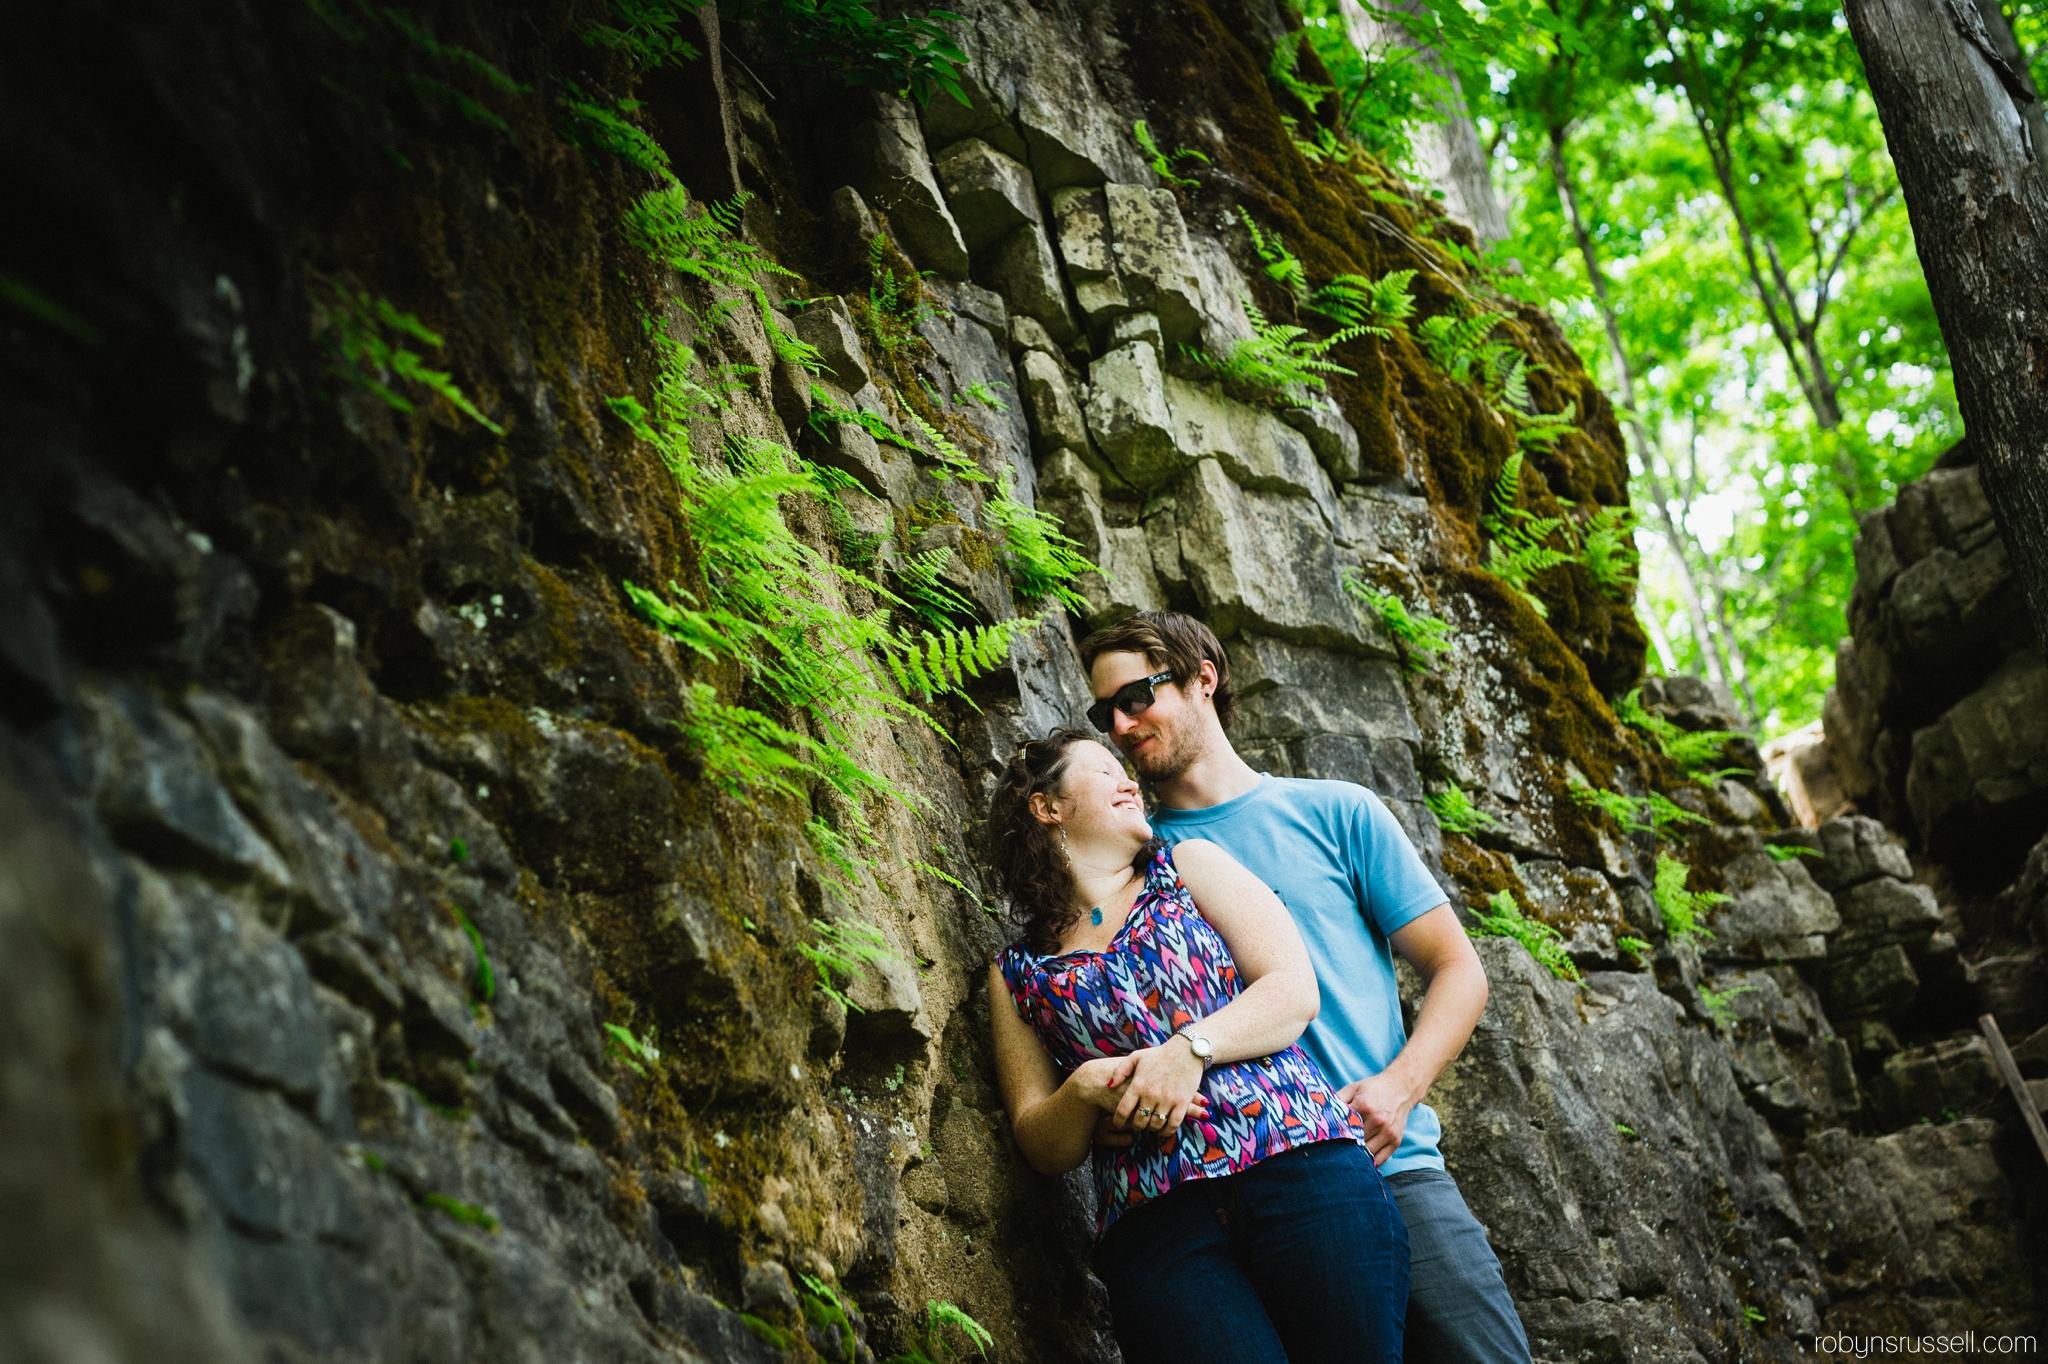 9-hiking-at-mount-nemo-burlington-couple.jpg